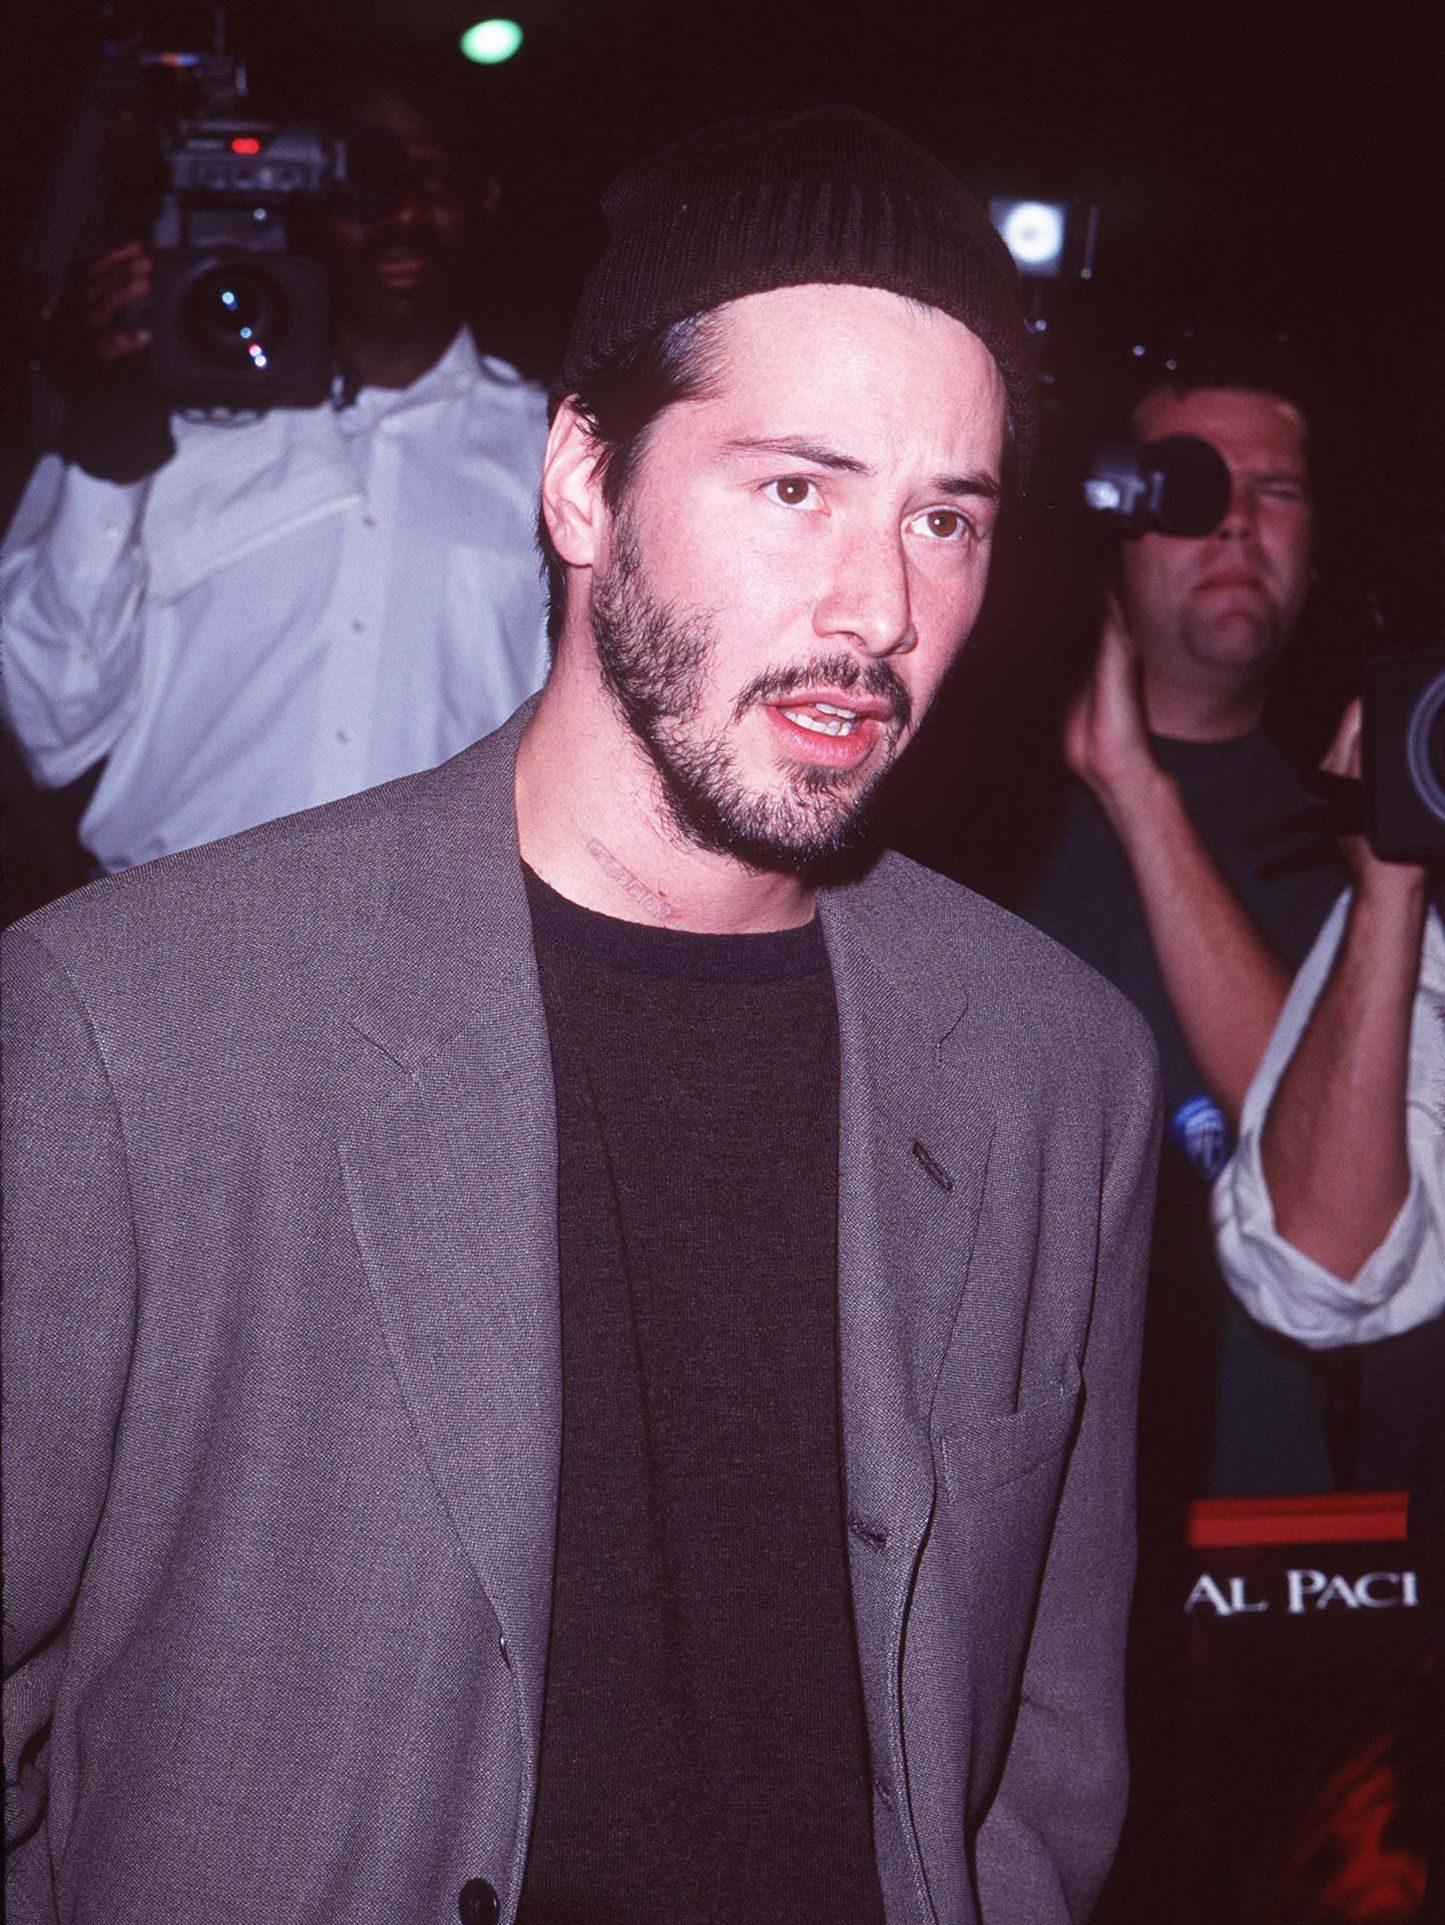 1997 10 03 The Devils Advocate Los Angeles Premiere 003 e1558696916166 25 Keanu Facts Only True Fans Know